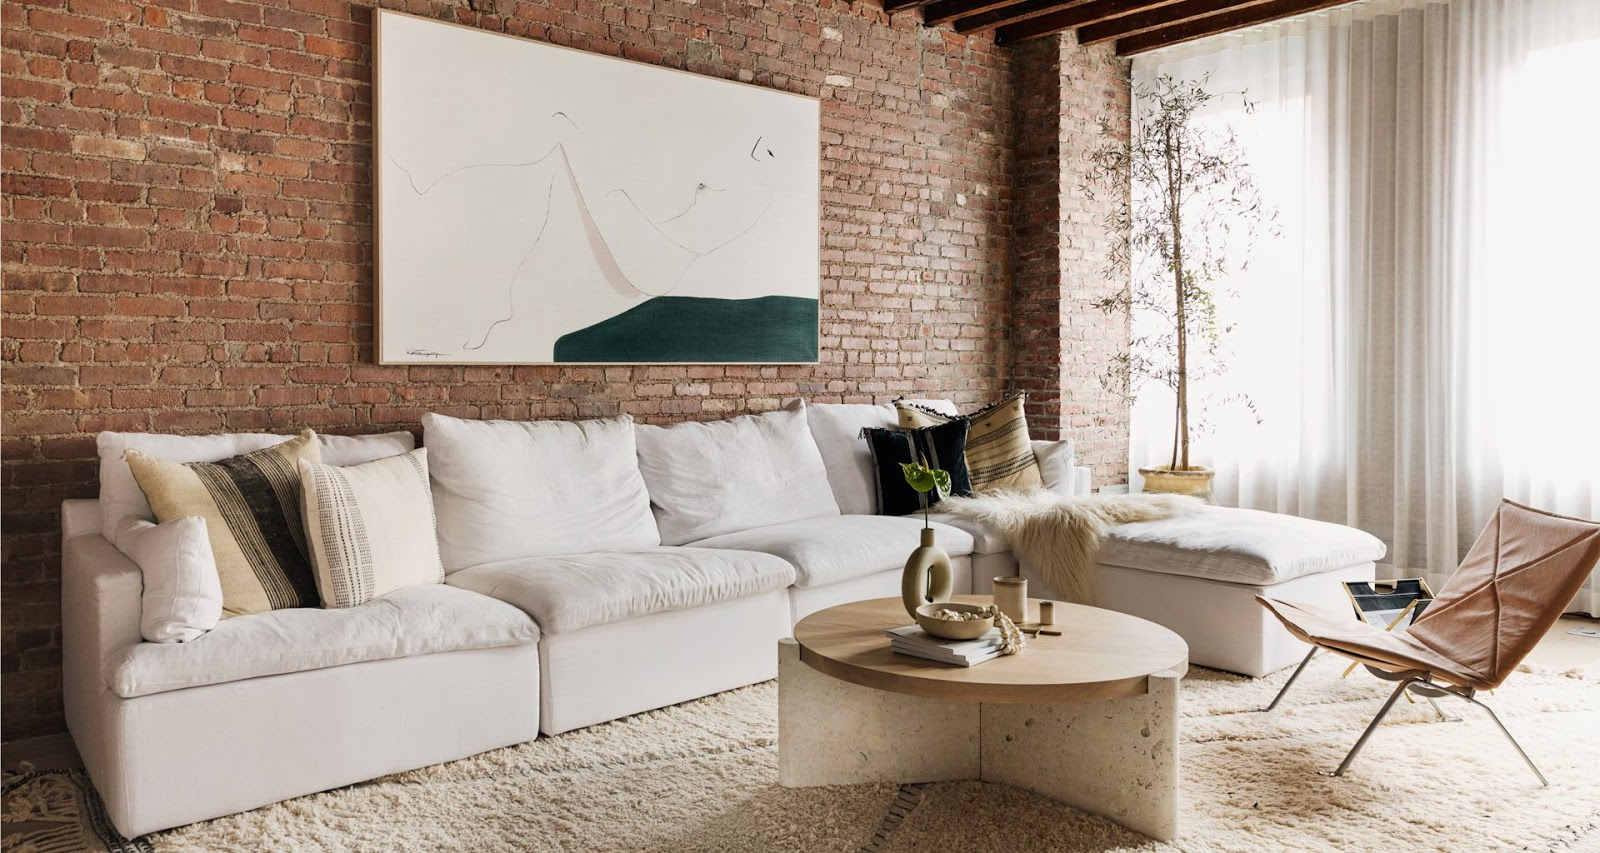 A New York loft by interior designer Tina Rich